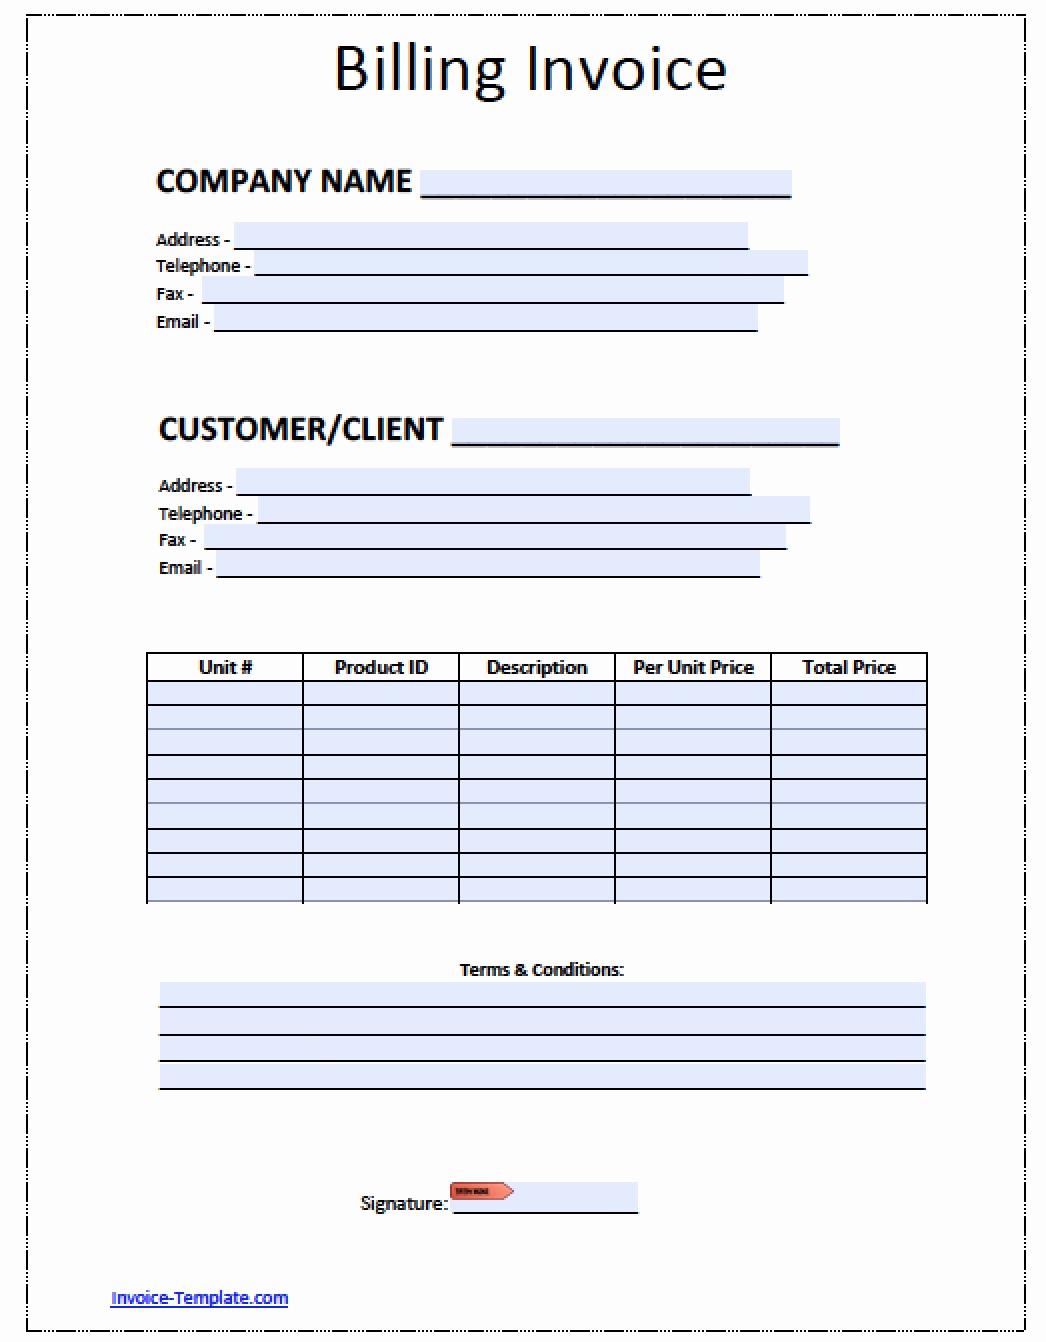 Blank Invoice Template Word Luxury Billing Invoice Template Download Free Blank Invoice